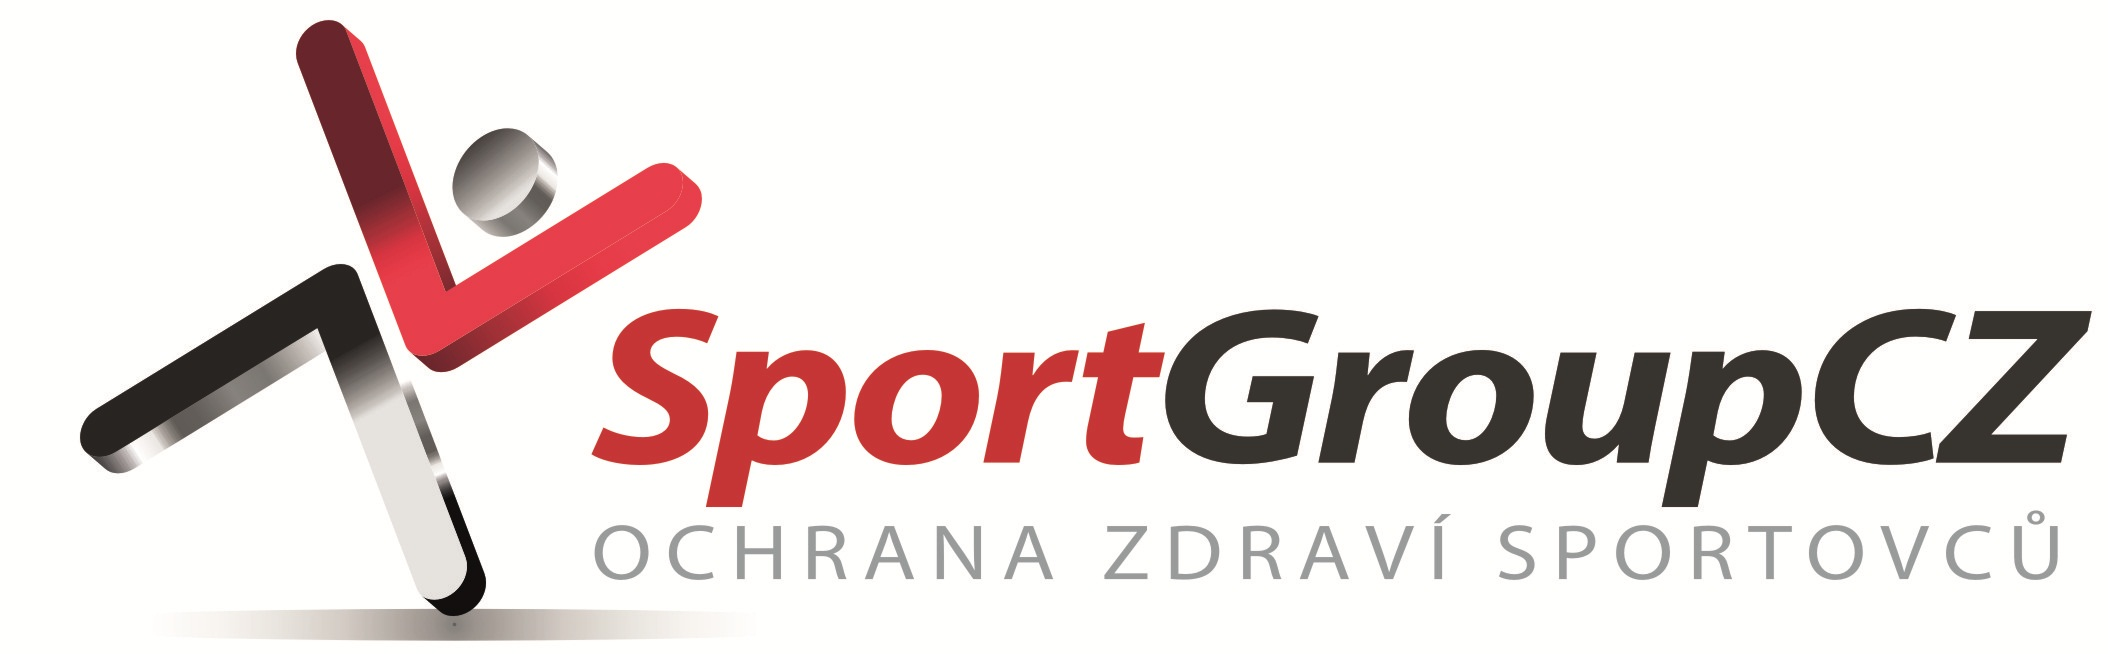 sport group logo corel draw